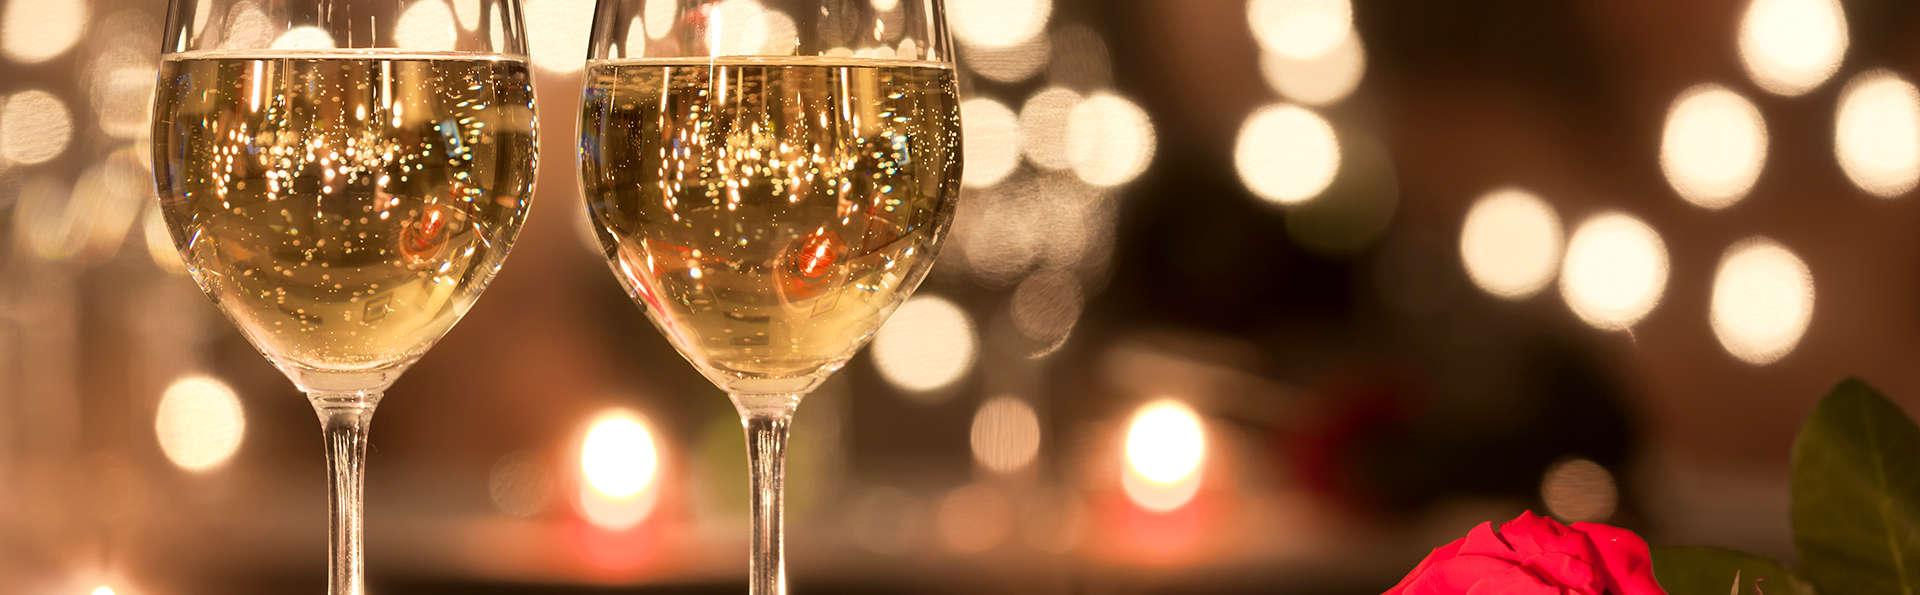 Dîner 4 plats avec accord mets et vins à Maastricht